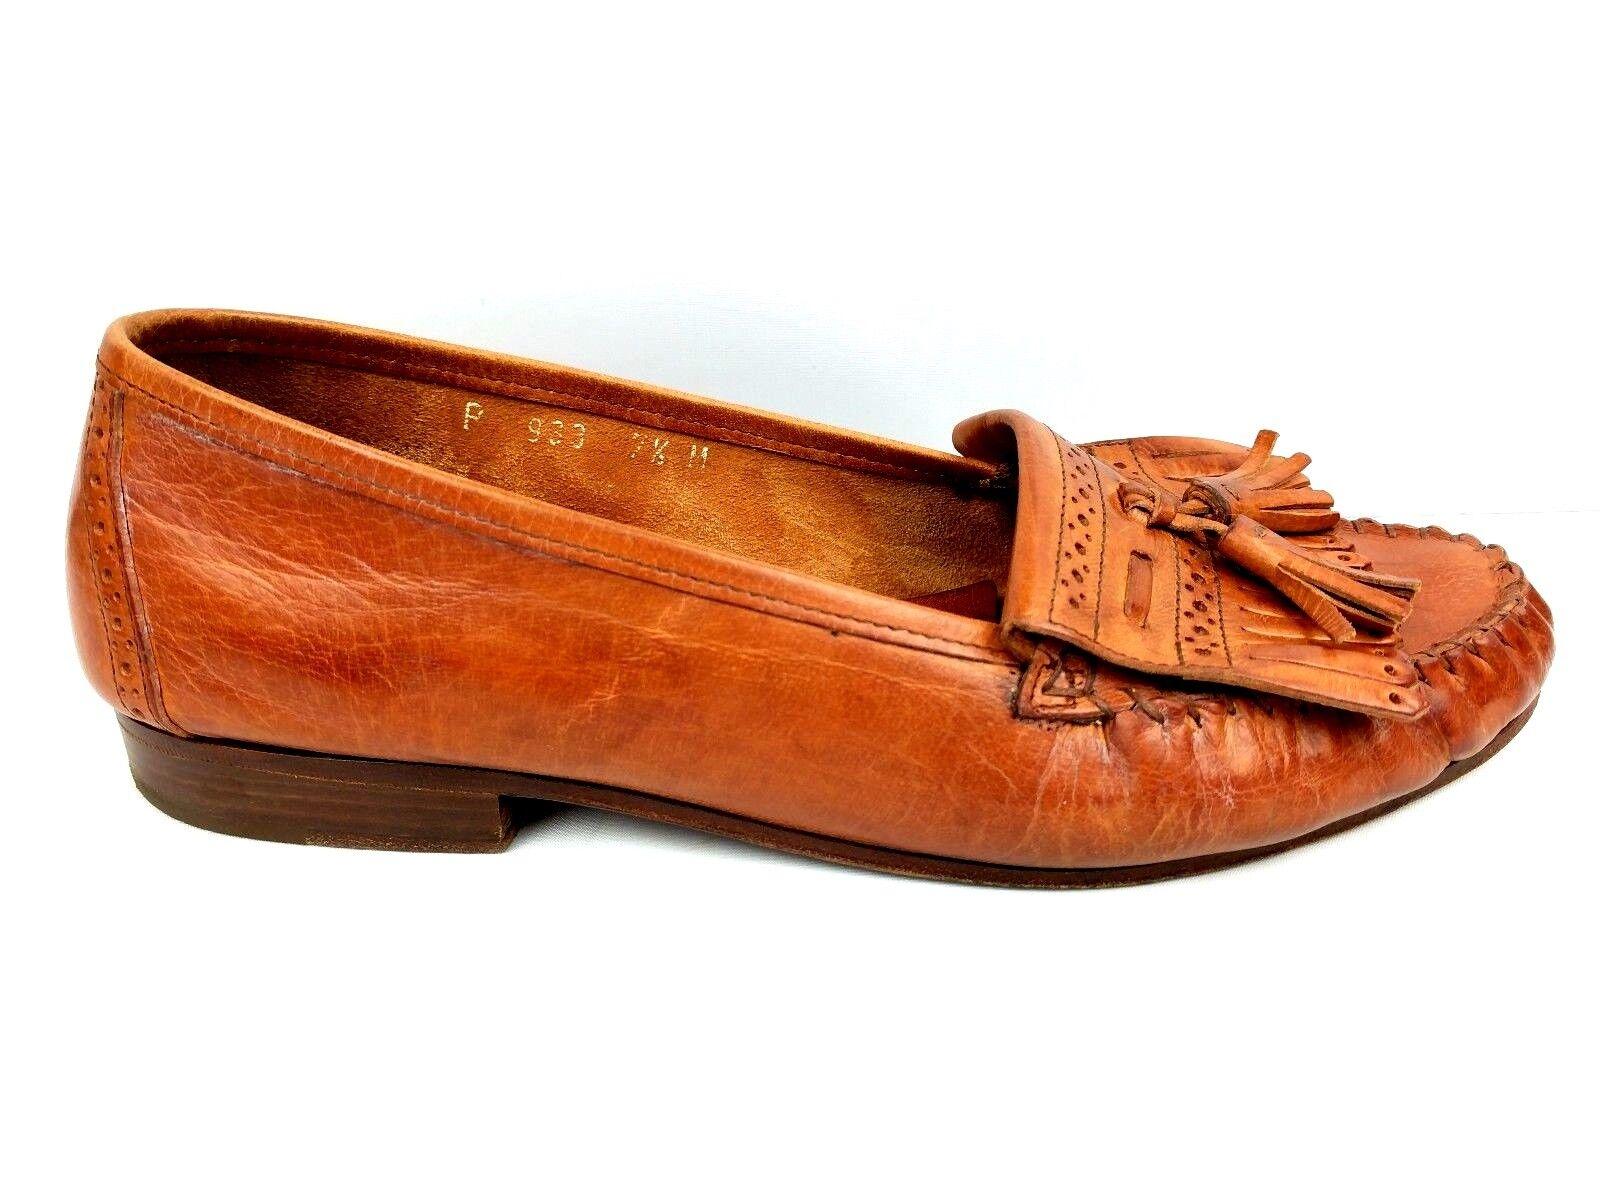 Cole Haan Womens Size 7.5 Brown Slides Slip On Tassel Kiltie  Loafer Casual